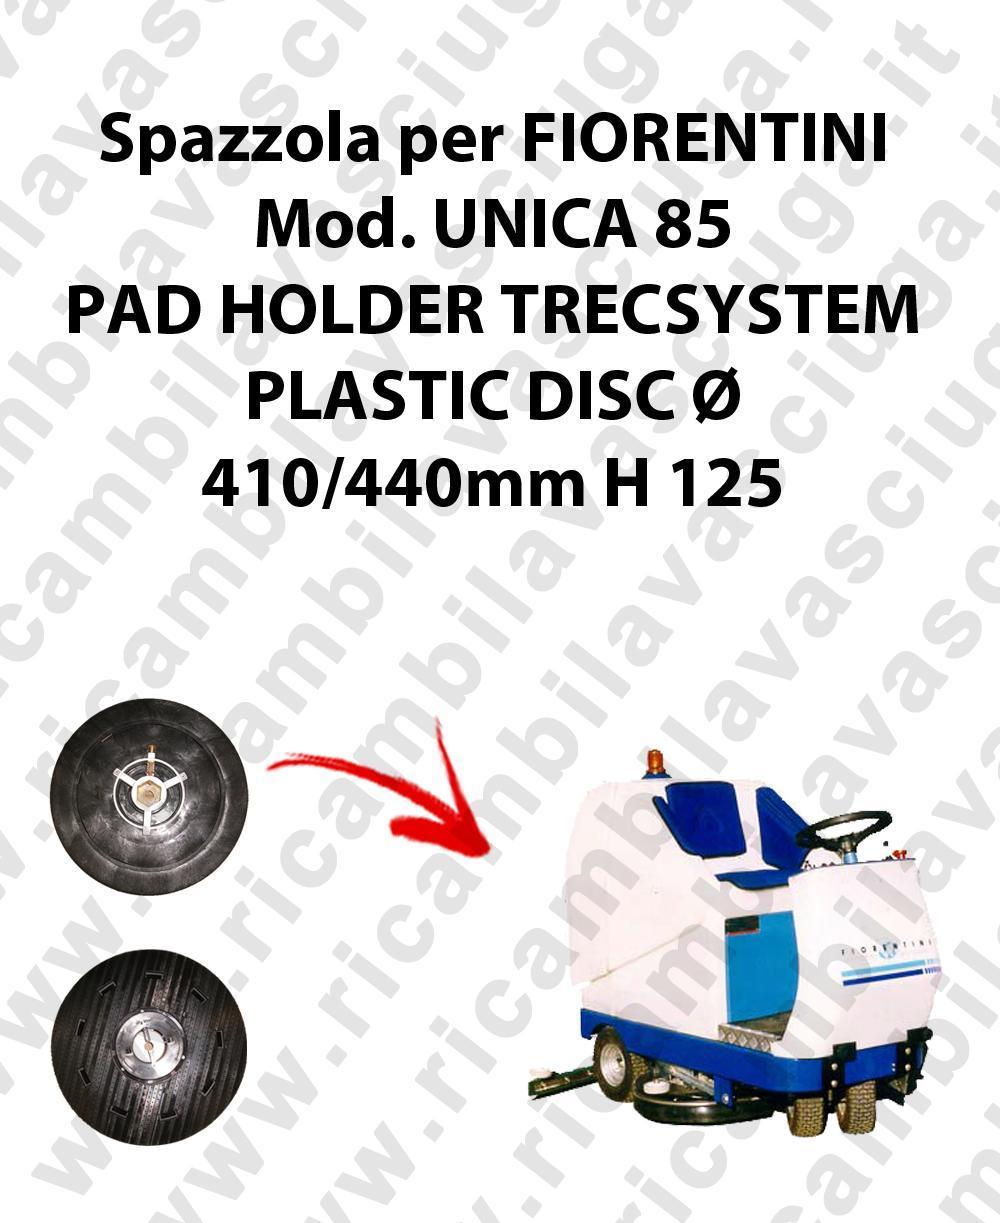 PAD HOLDER TRECSYSTEM  pour autolaveuses FIORENTINI Reference UNICA 85